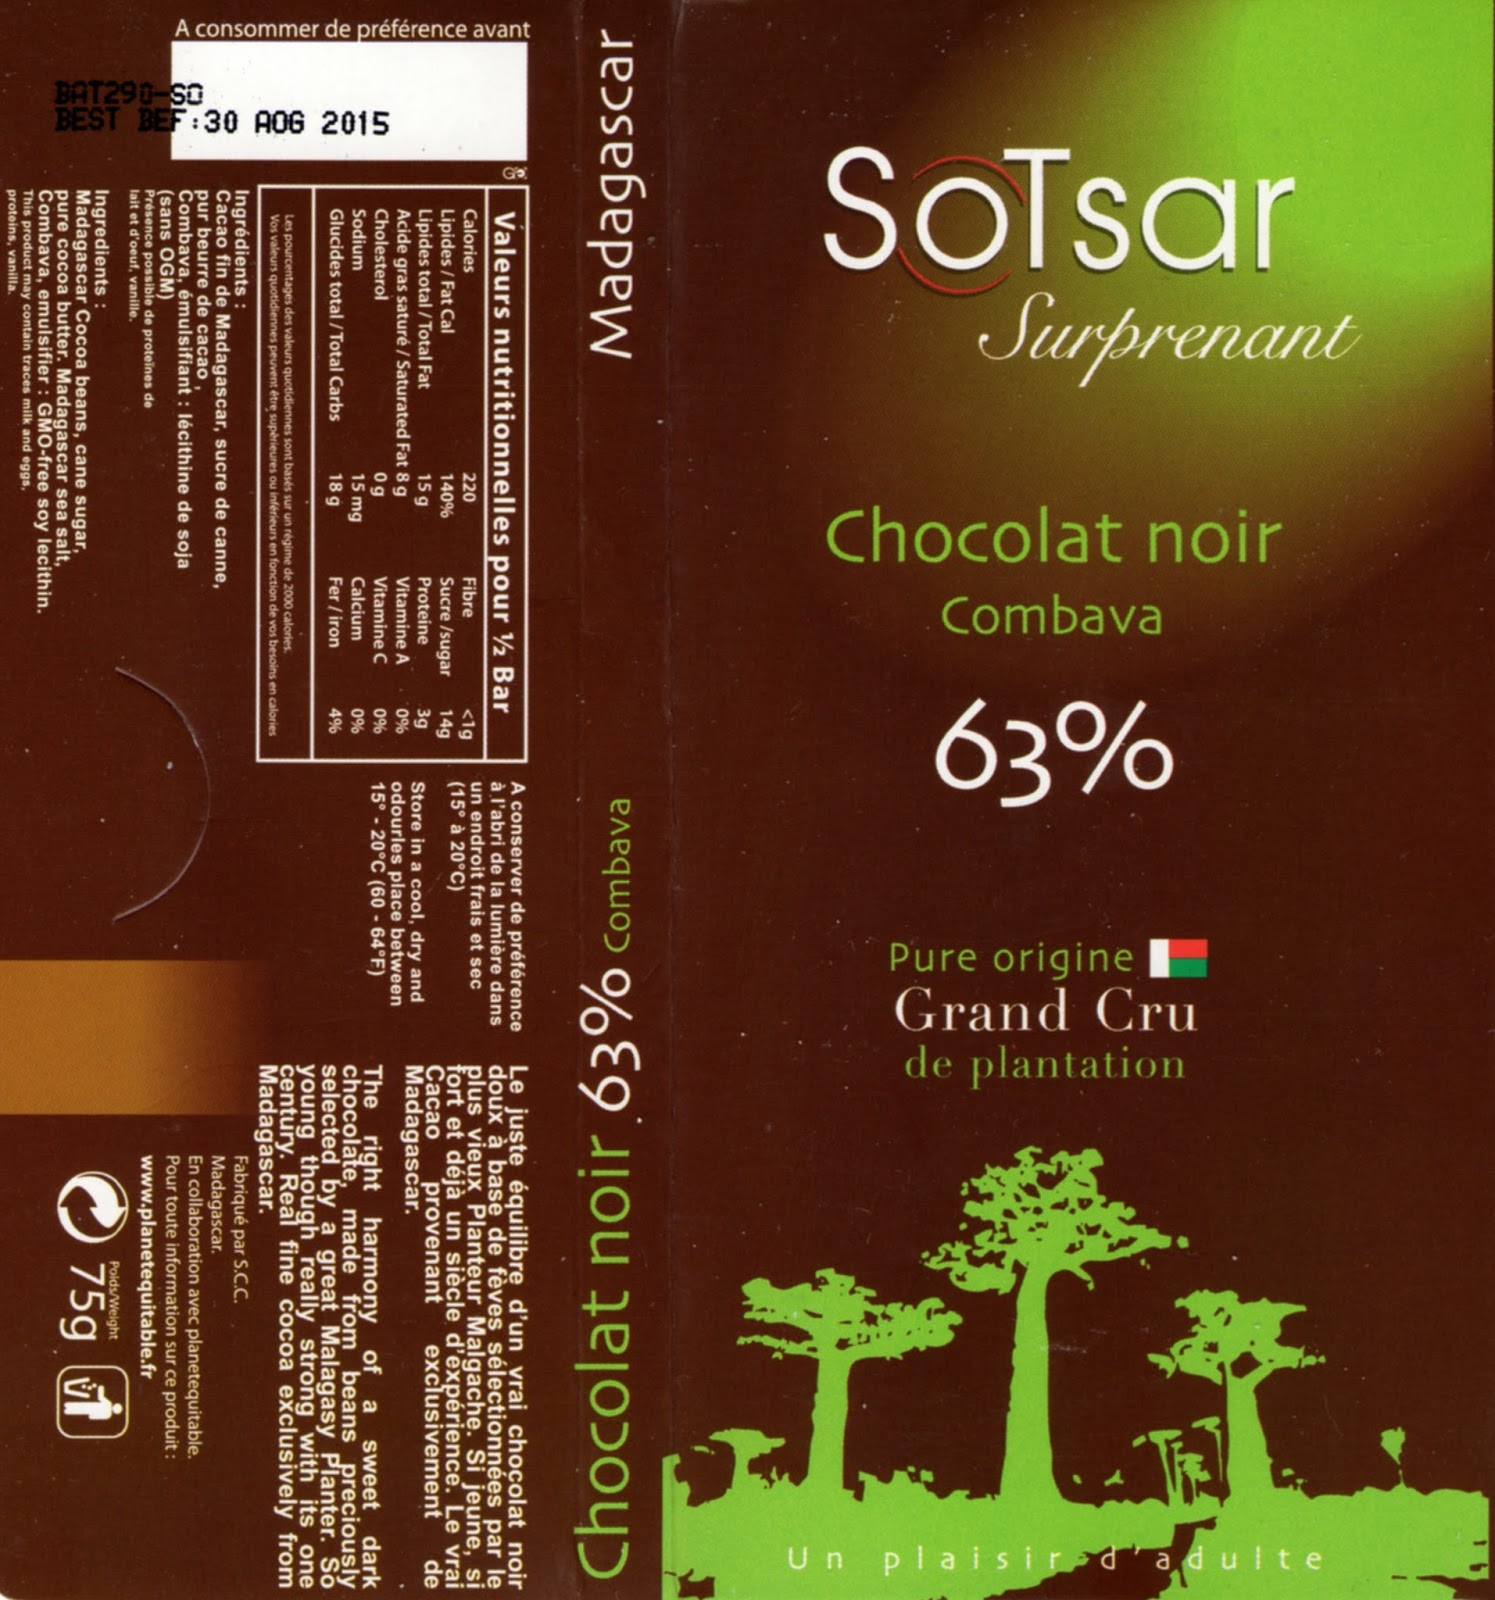 tablette de chocolat noir gourmand sotsar chocolat noir combava madagascar 63